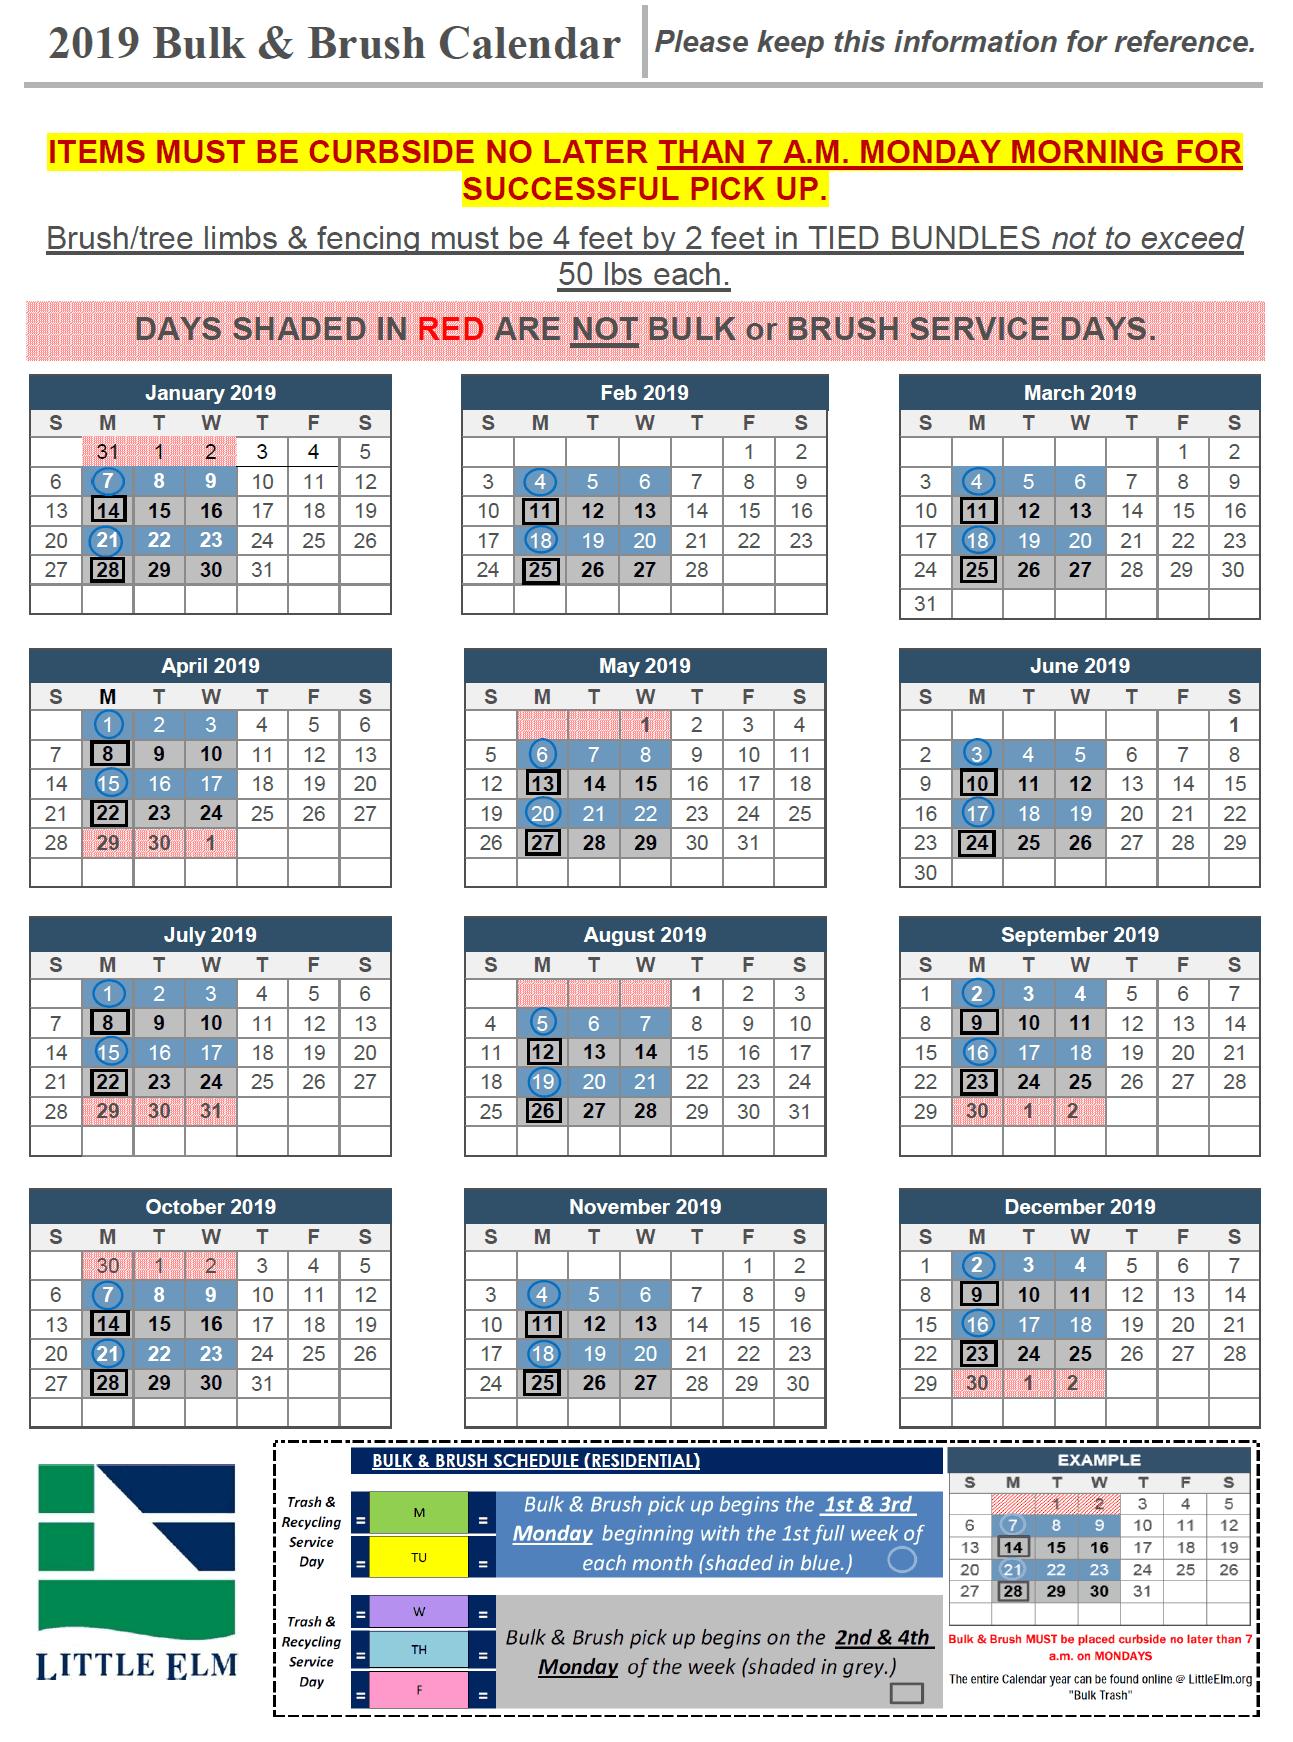 Republic Services Las Vegas Bulk Pickup Calendar 2019 ...